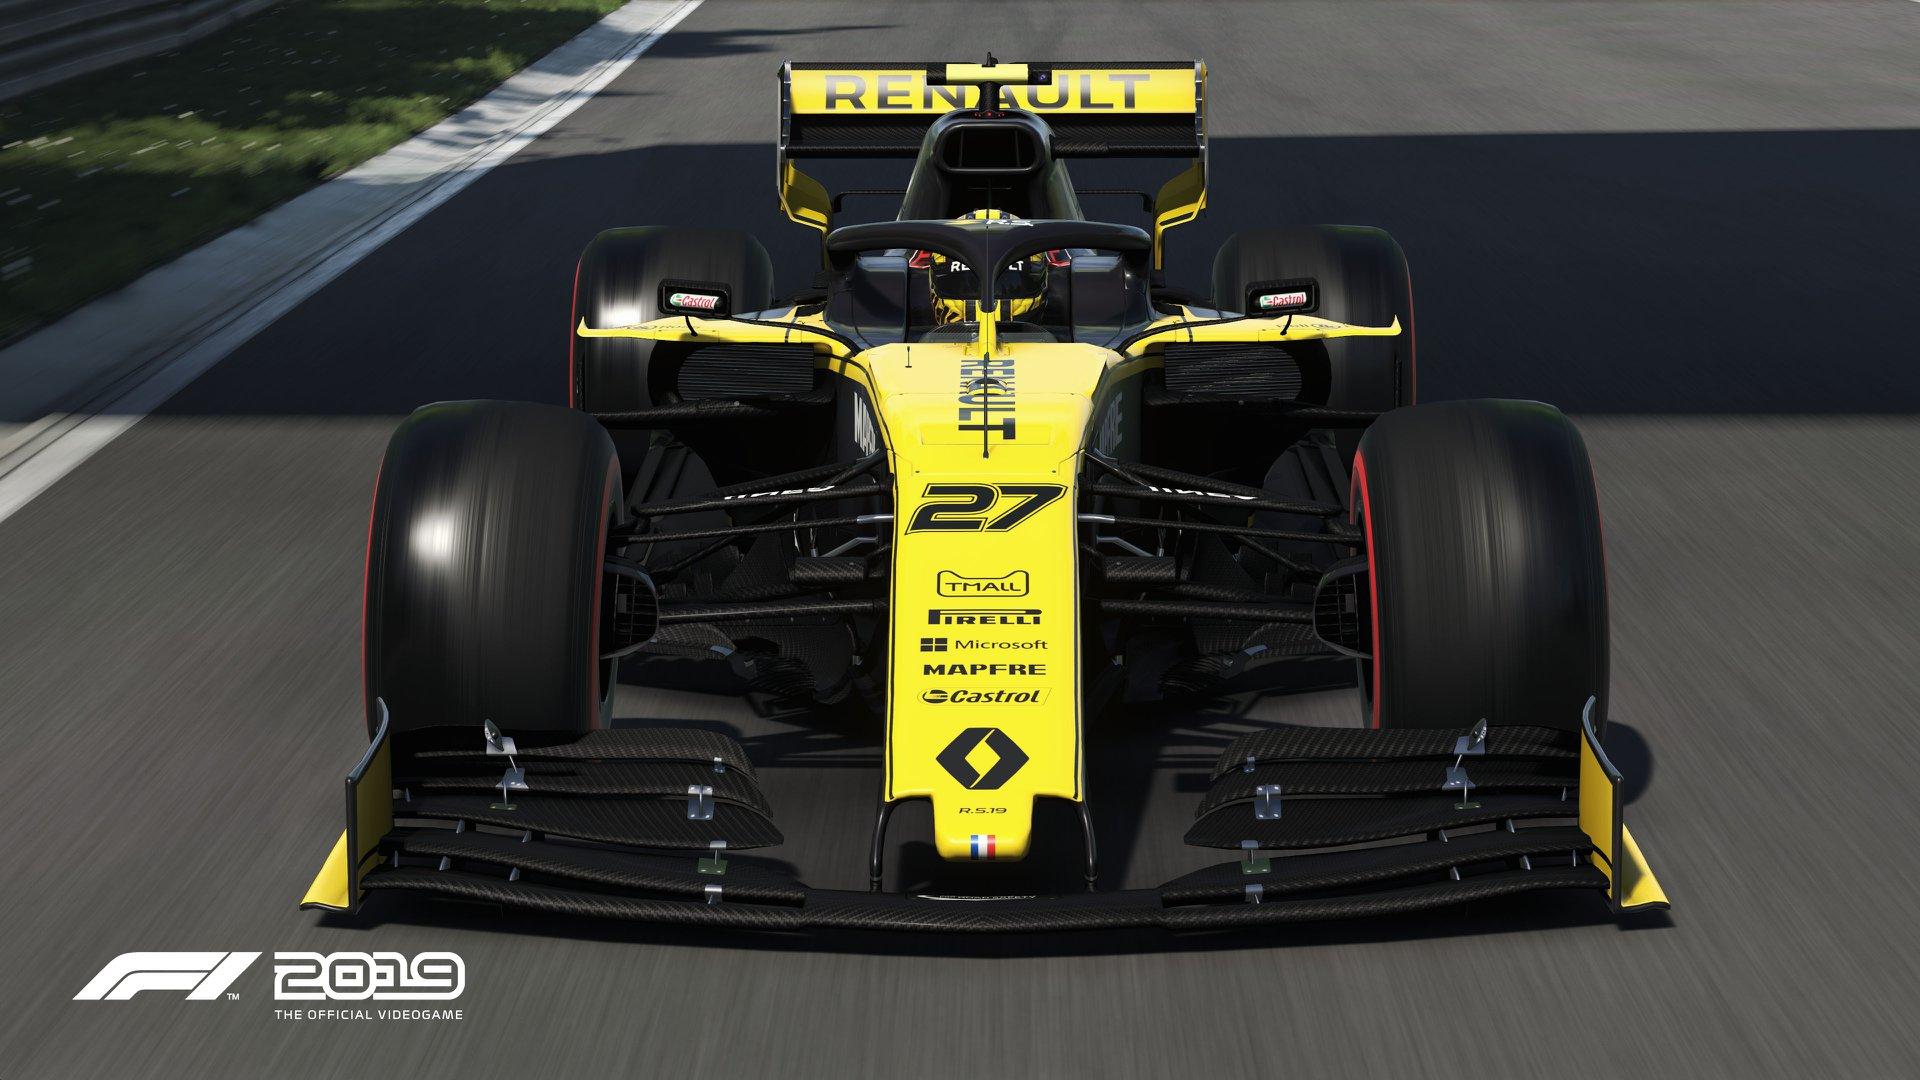 F1 2019: V1 09 Update Live Across All Platforms